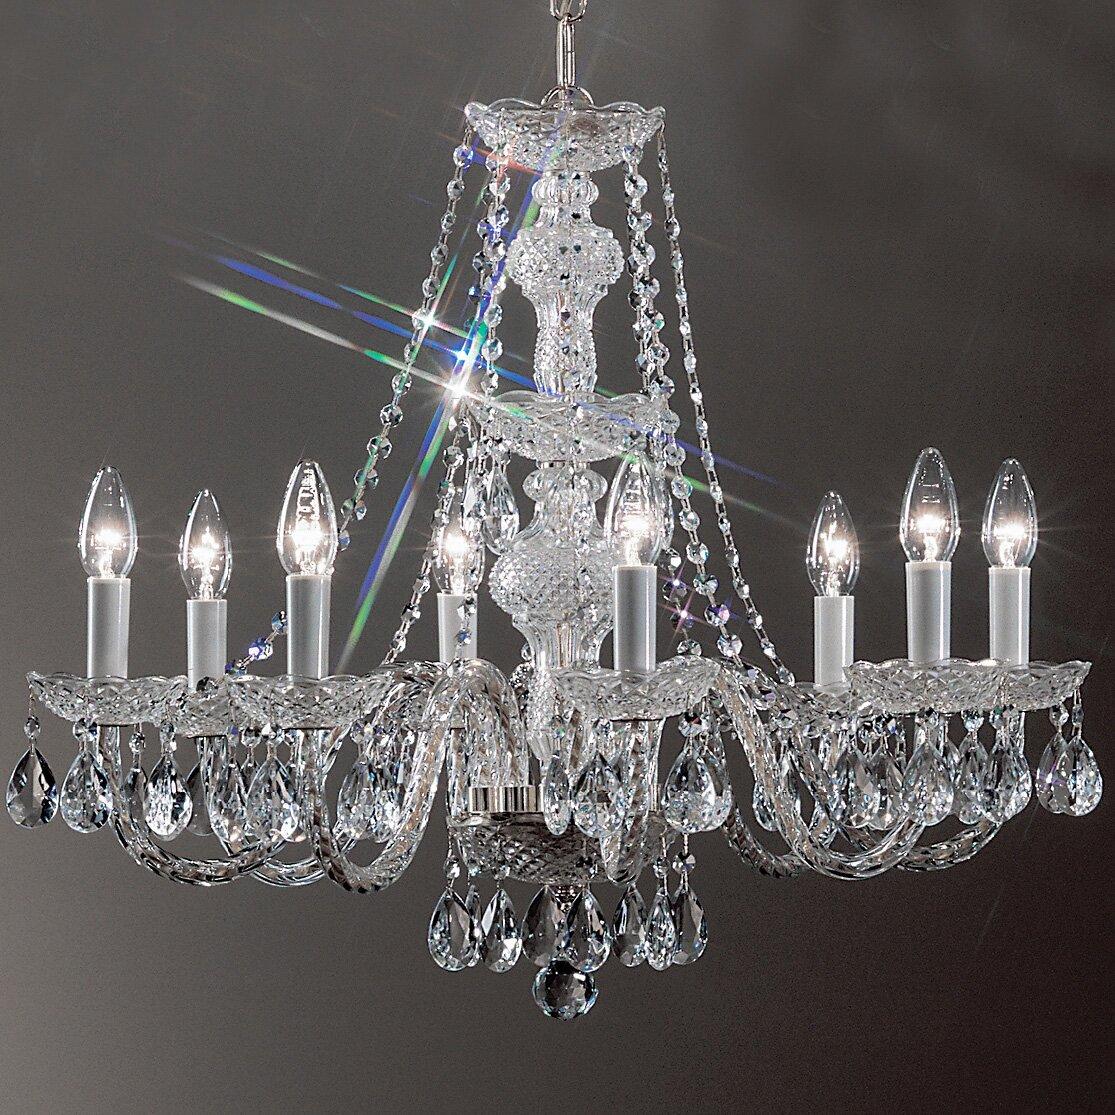 Classic Lighting Monticello 8Light Crystal Chandelier Reviews – Crystal Chandelier Lights